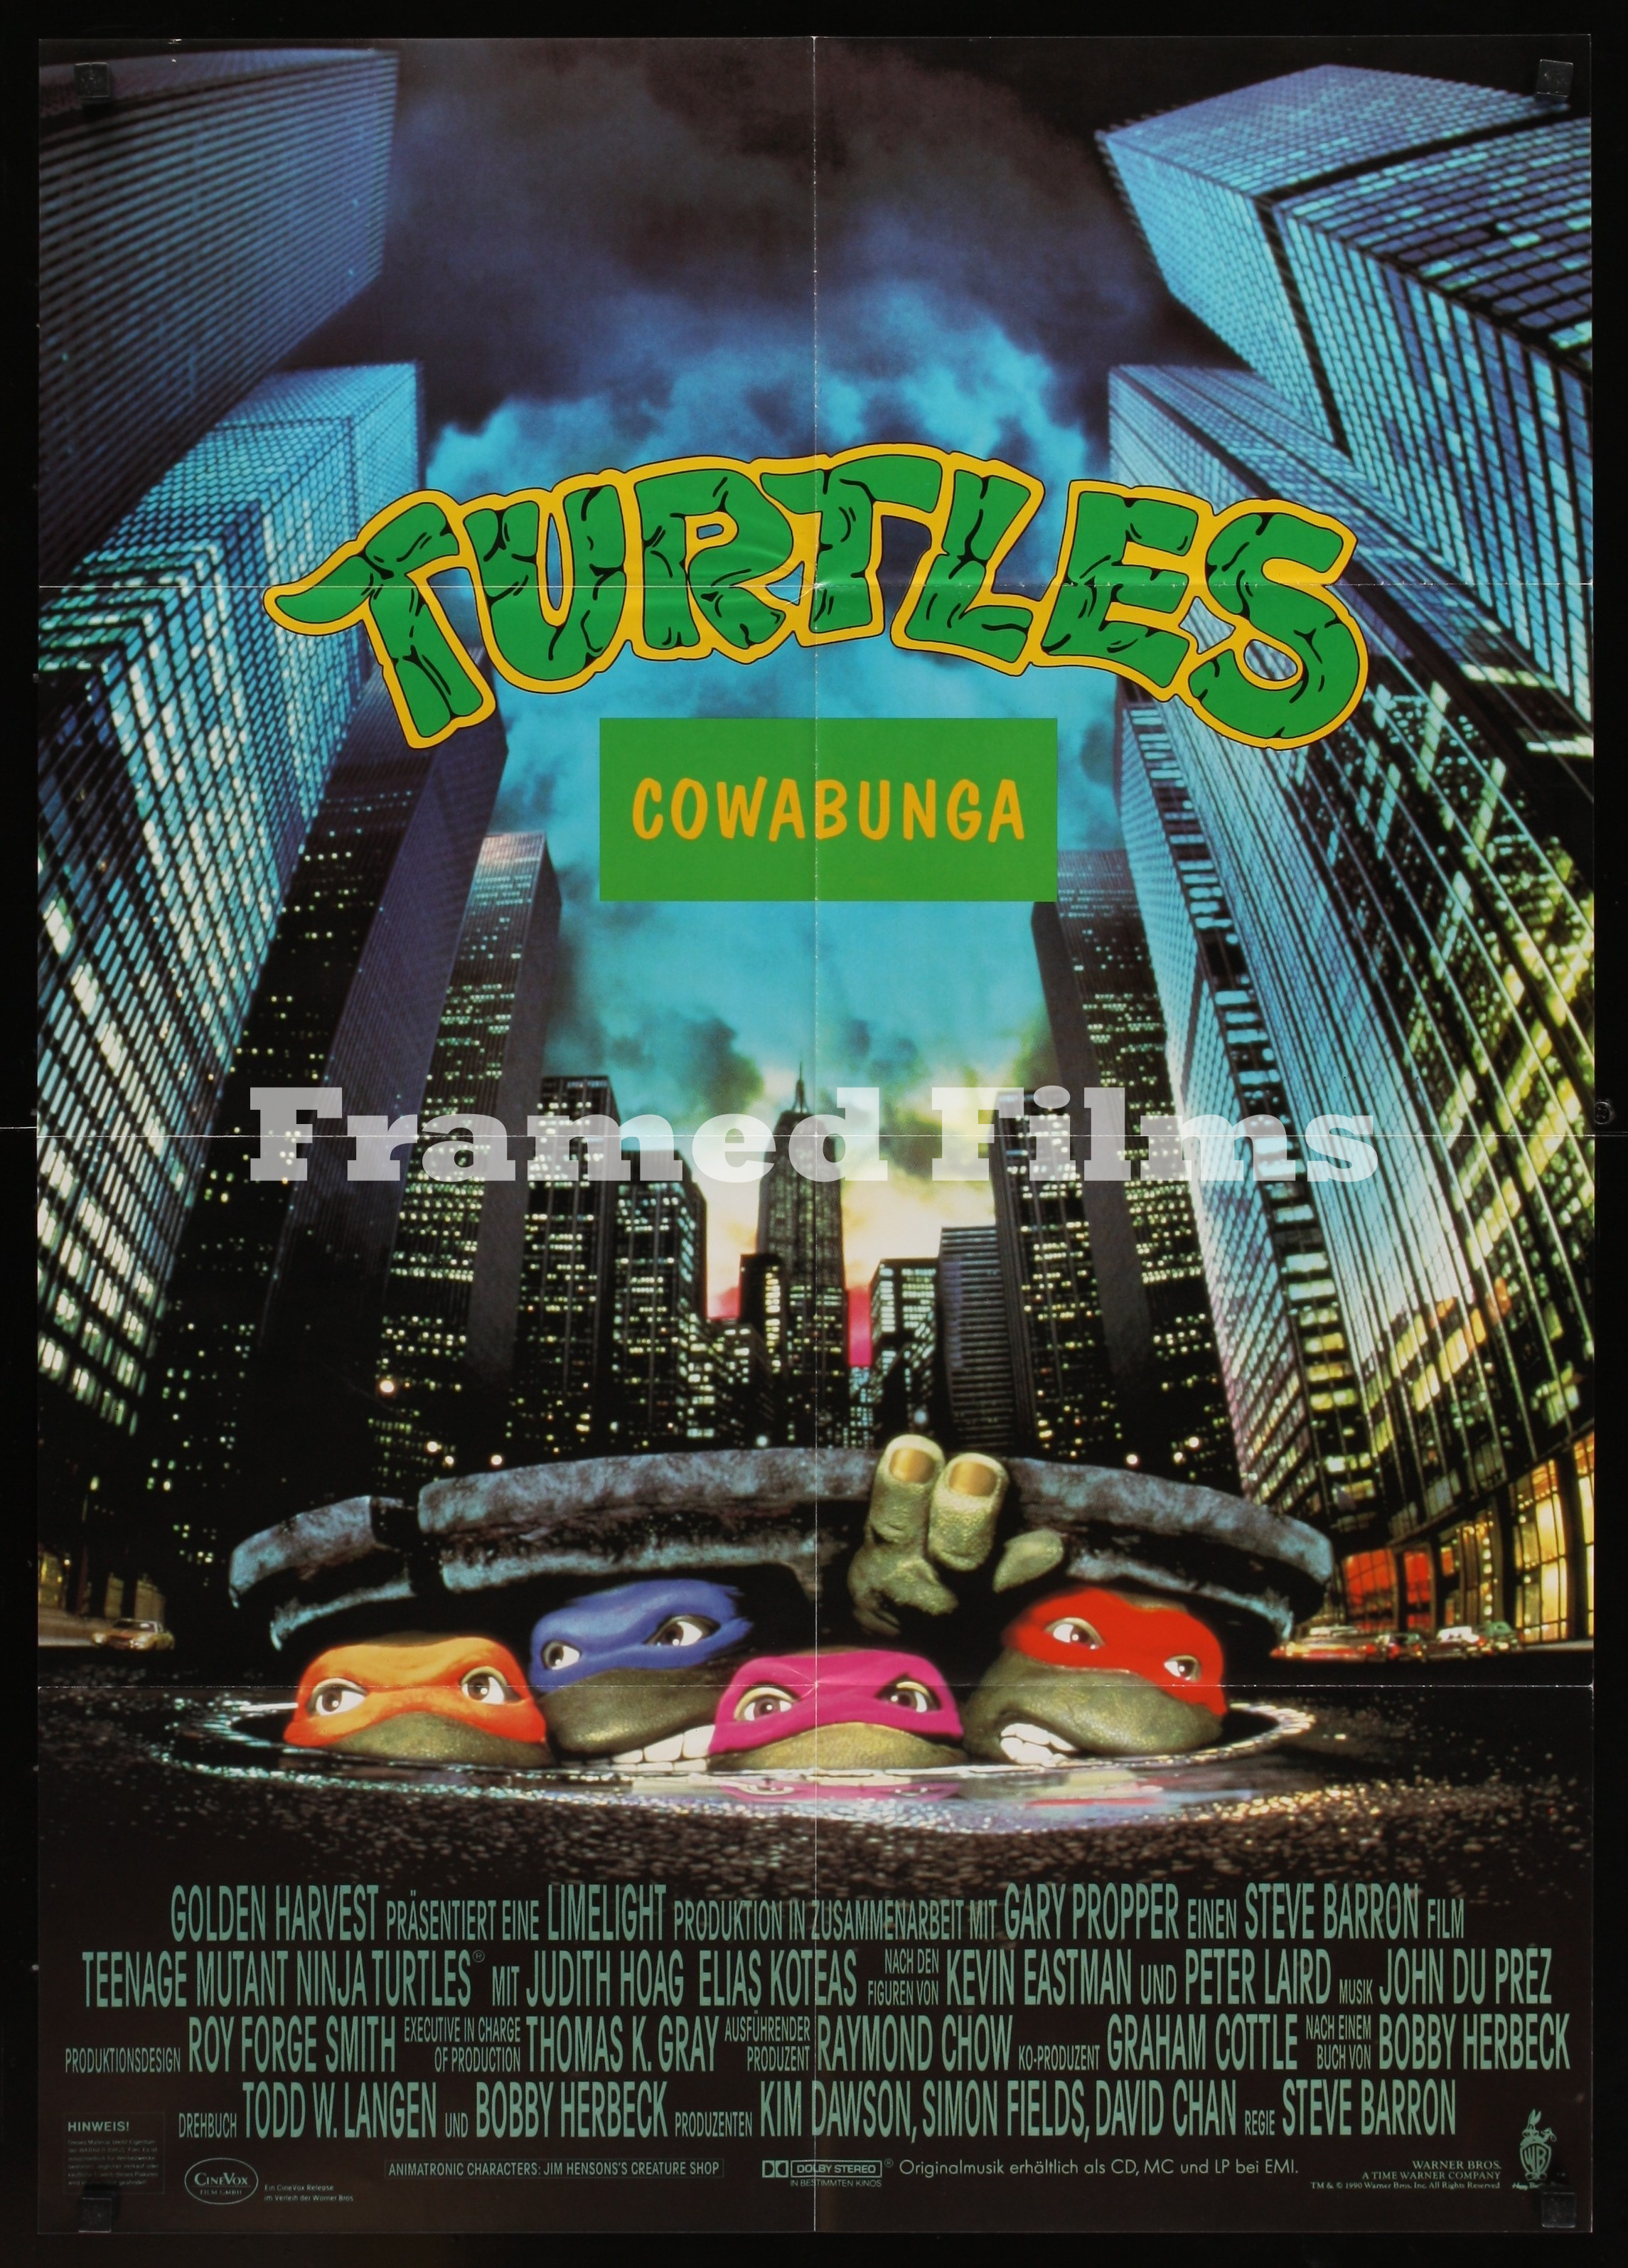 german_a1_teenage_mutant_ninja_turtles_NZ03867_L.jpg